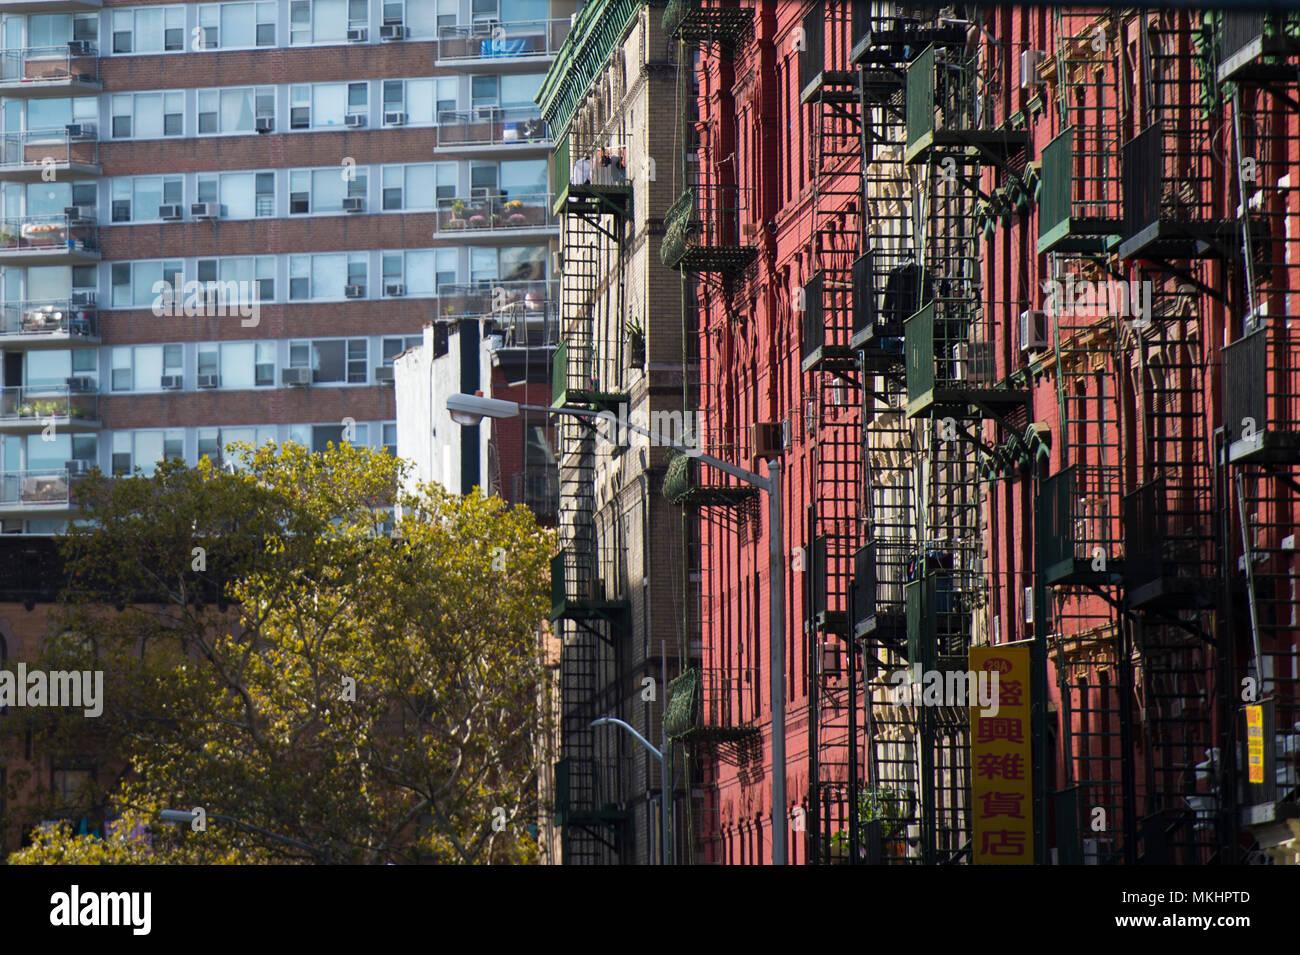 NEW YORK - USA - 28. Oktober 2018. Blick auf New York City Apartment gebäude mit Treppen entlang Mott Street in Chinatown Stockbild